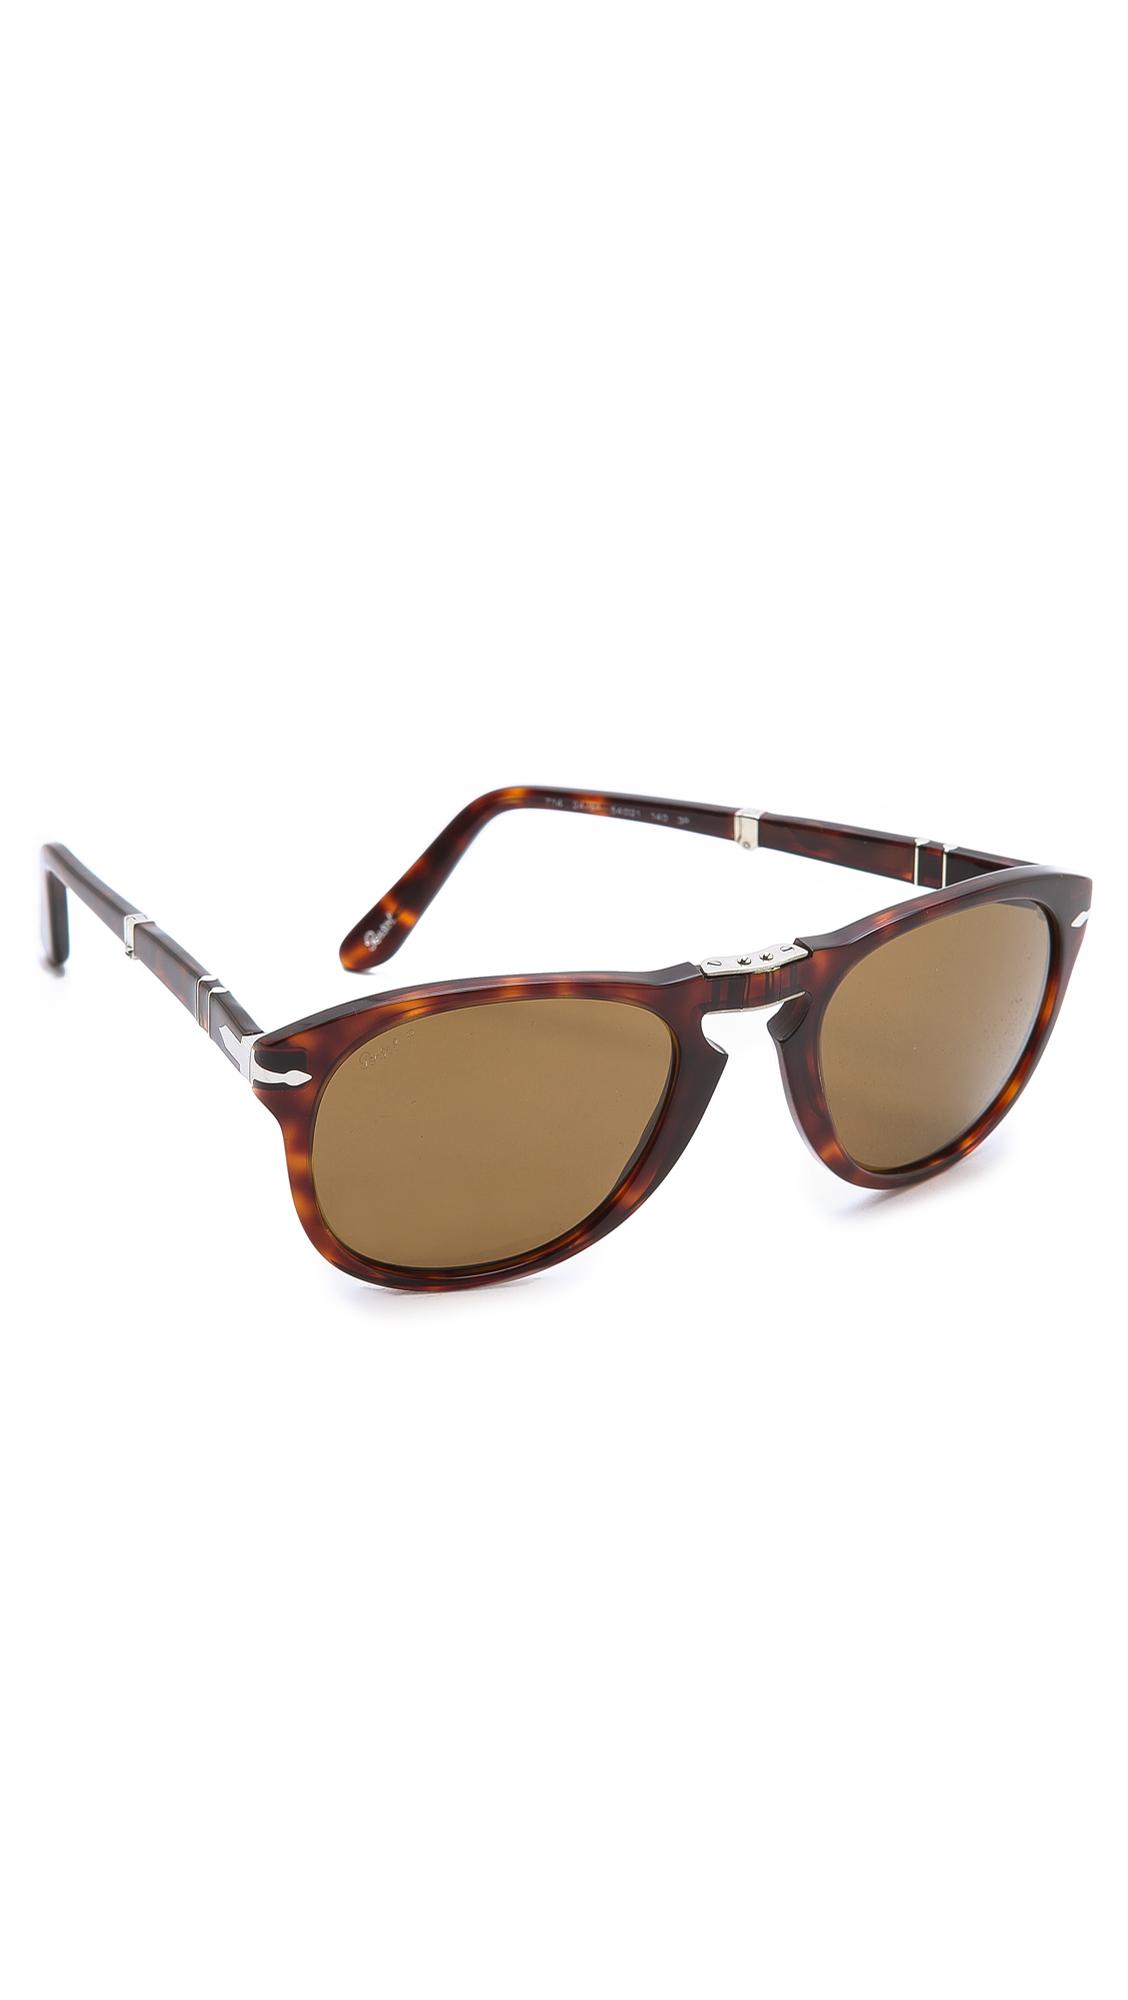 04cd41768a Persol Classic 714 Folding Polarized Sunglasses